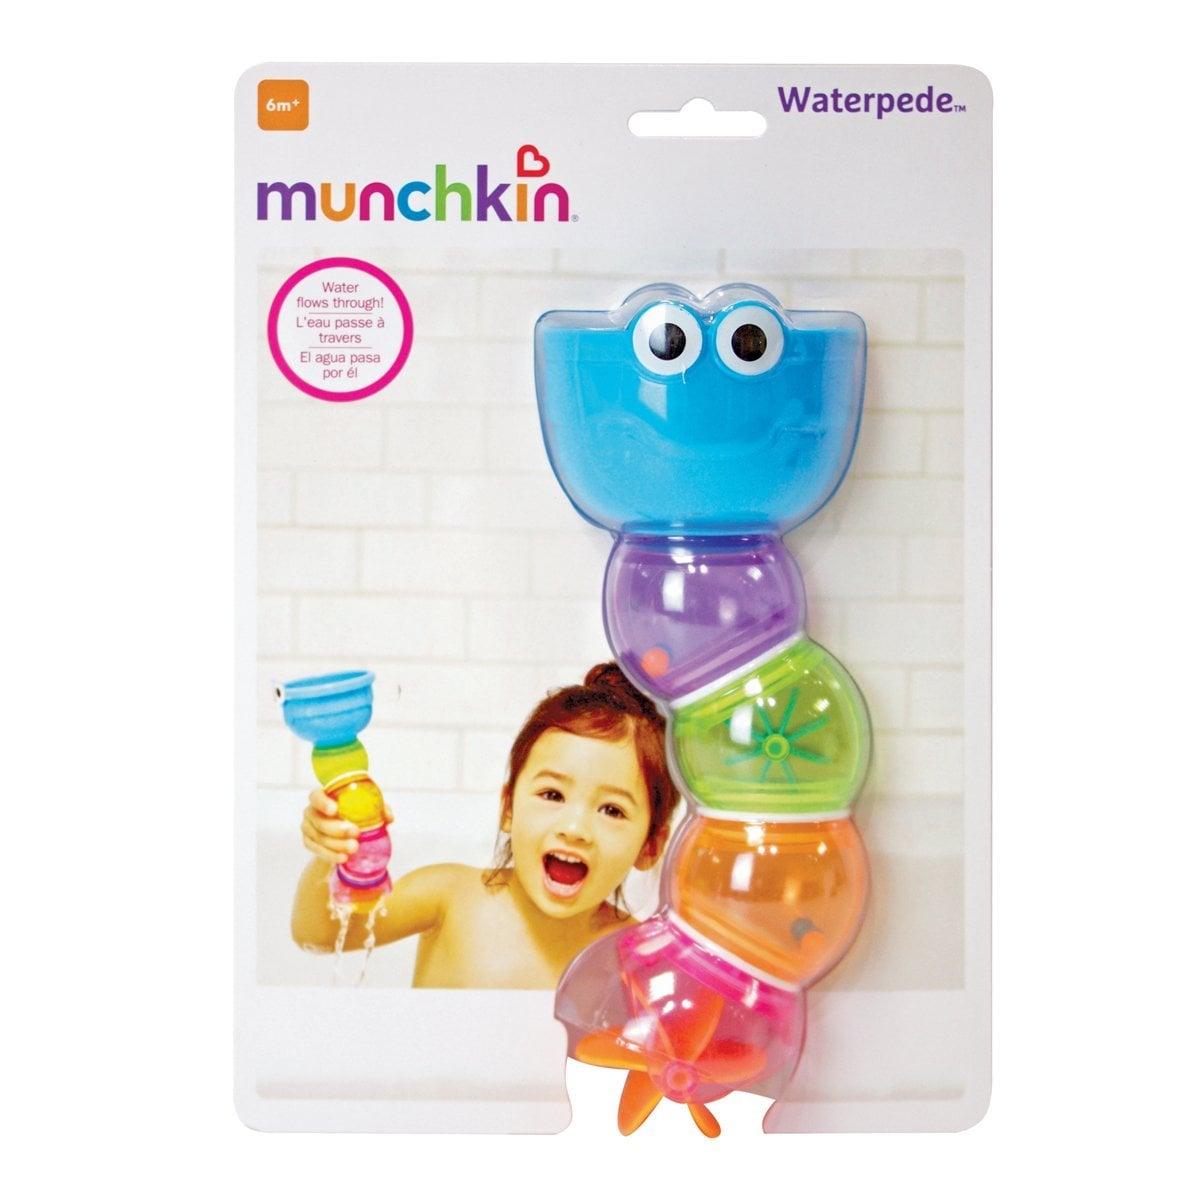 Munchkin Waterpede Bath Toy Recall May 2018   POPSUGAR Family